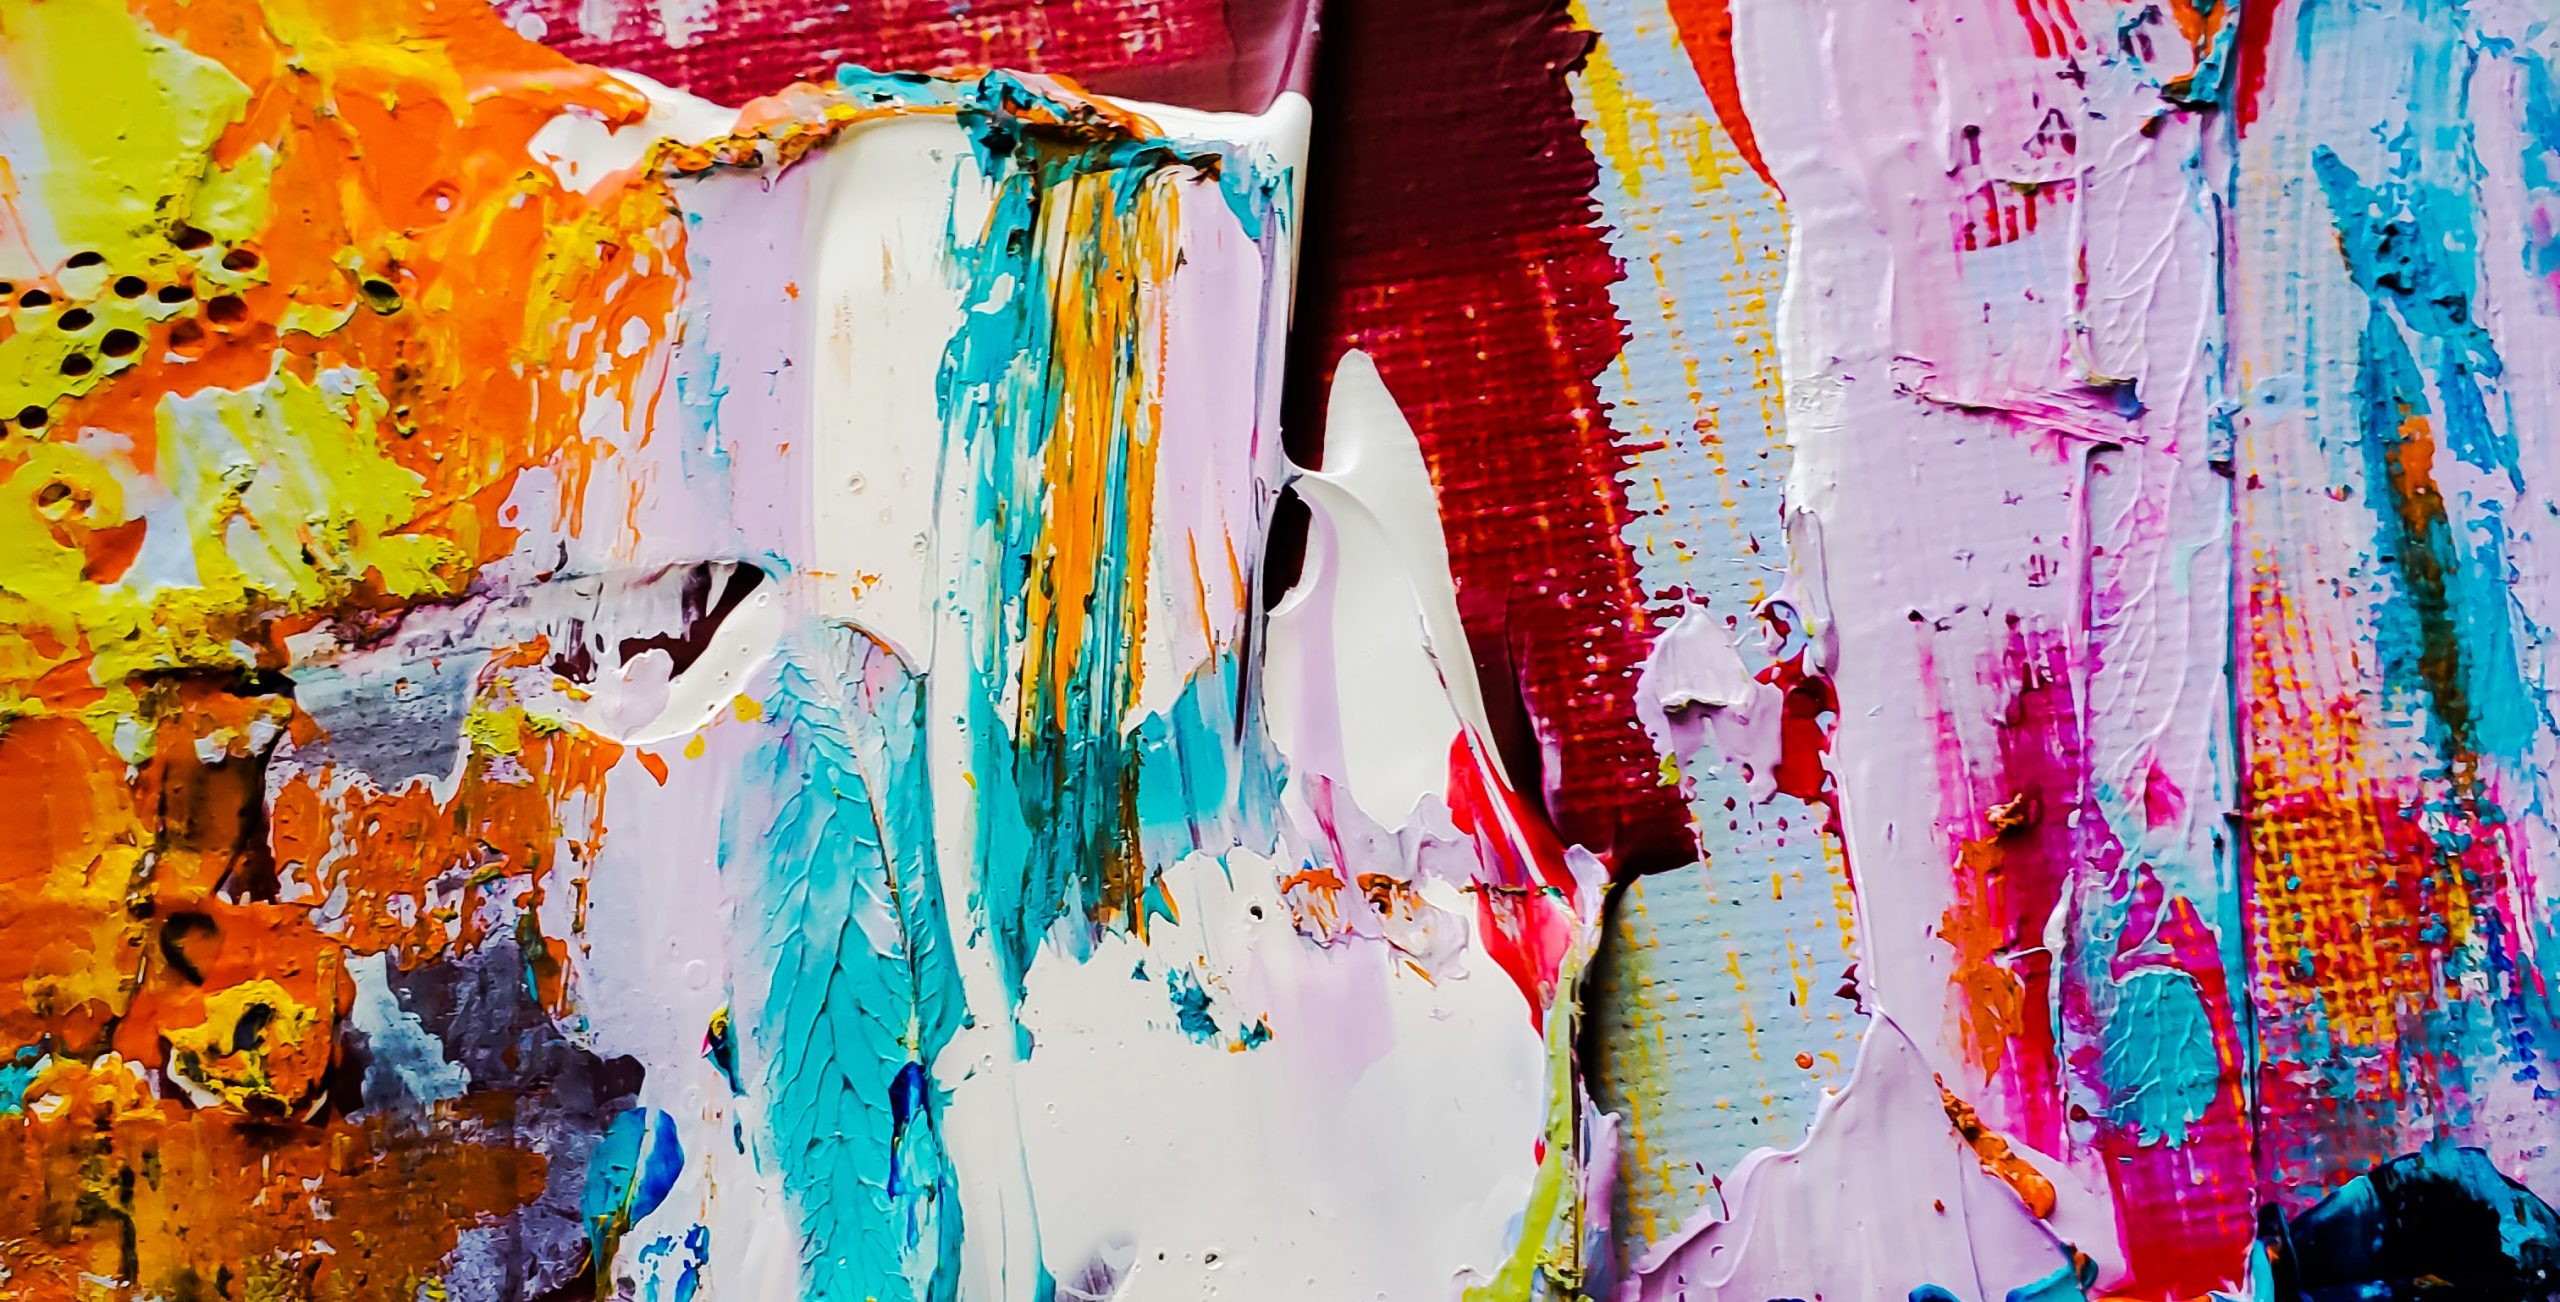 art therapy helps trauma